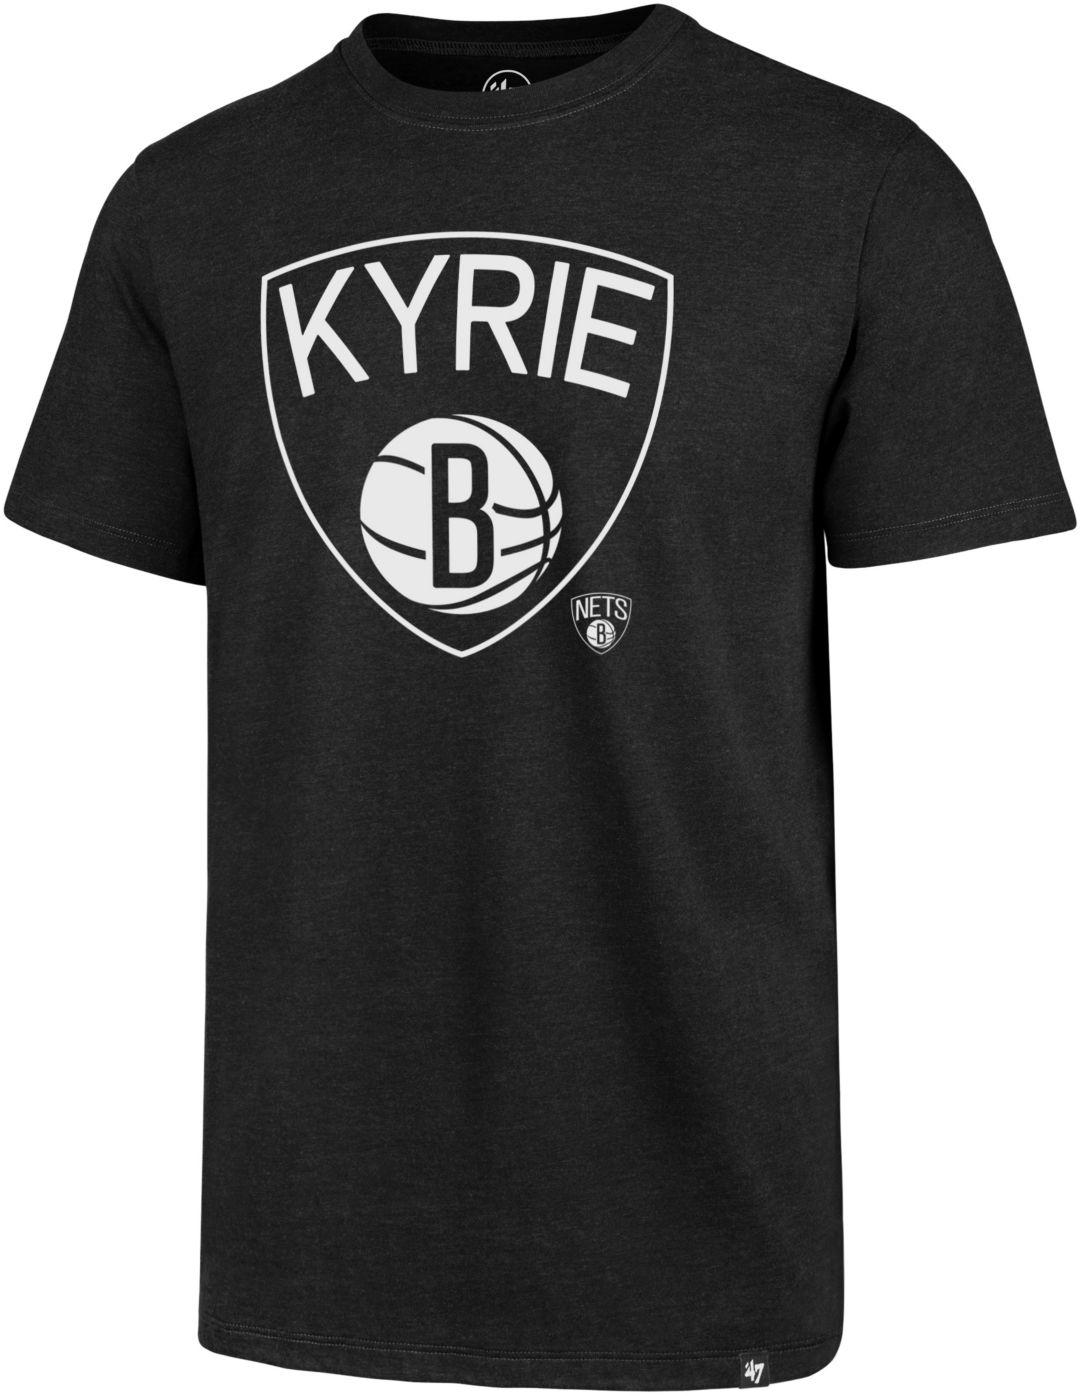 another chance 29b6e 04071 '47 Men's Brooklyn Nets Kyrie Irving Black T-Shirt